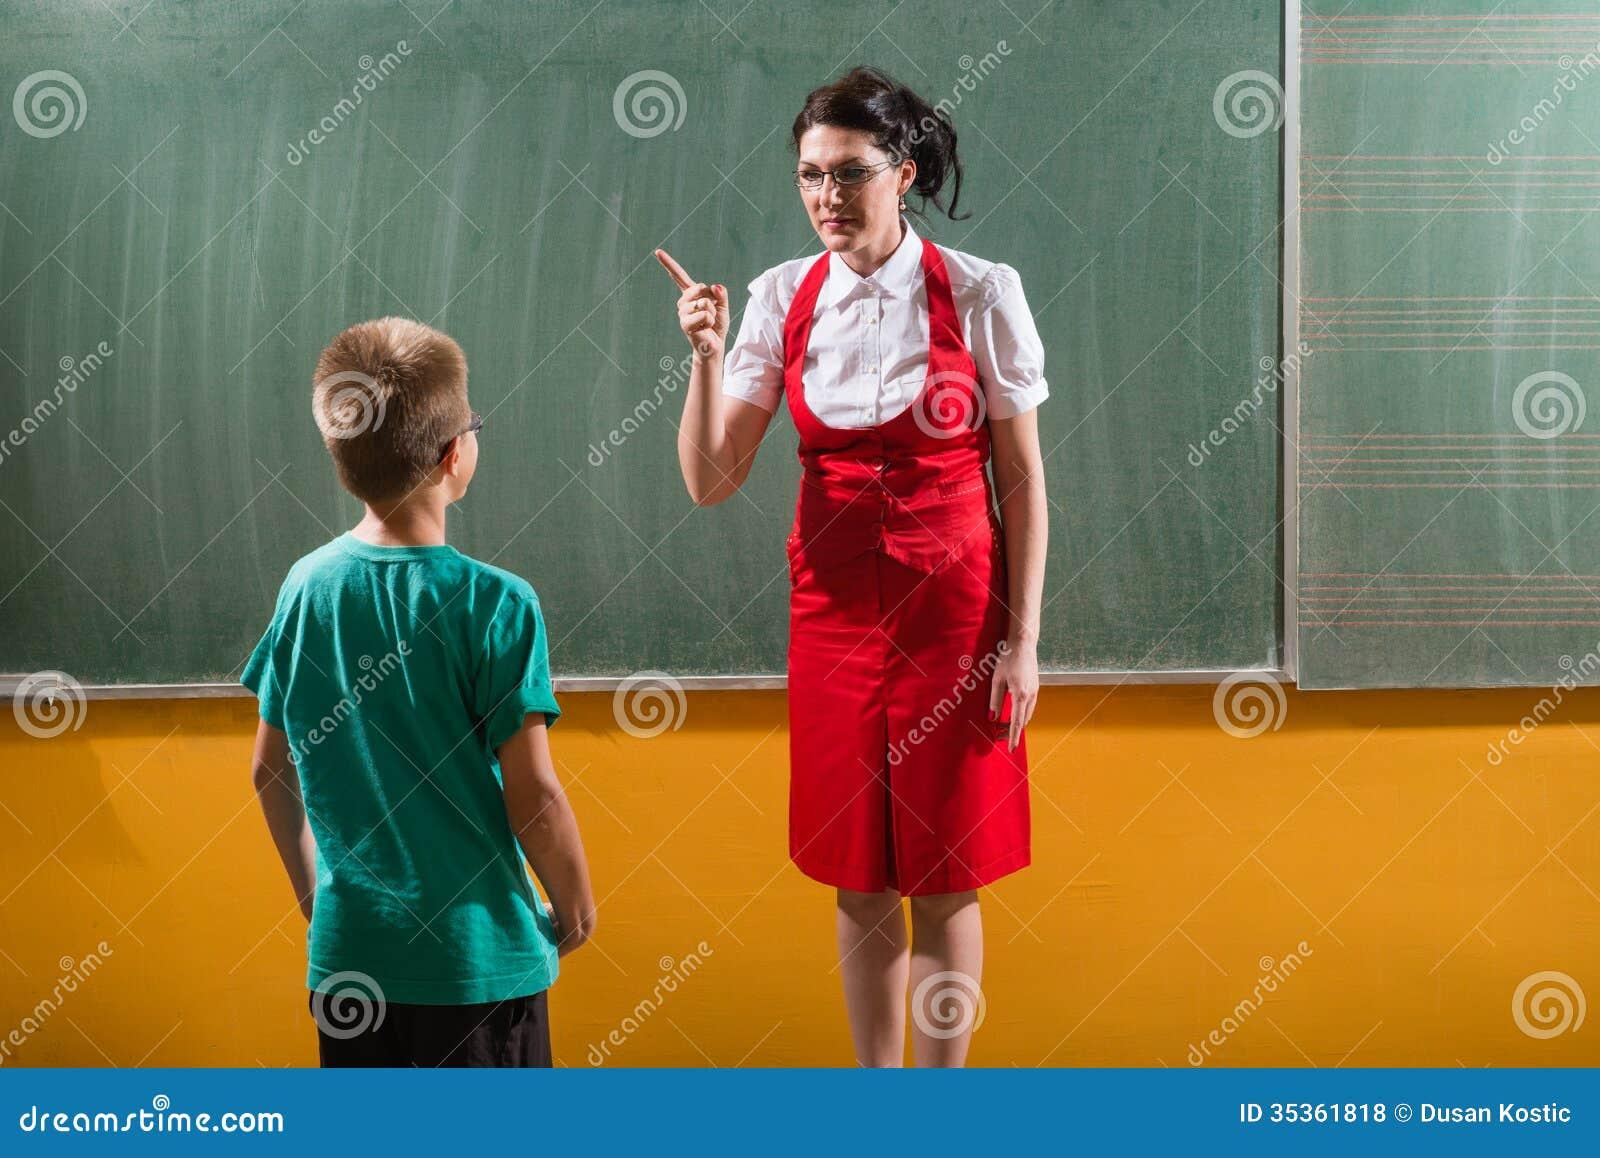 lack of discipline in students essay